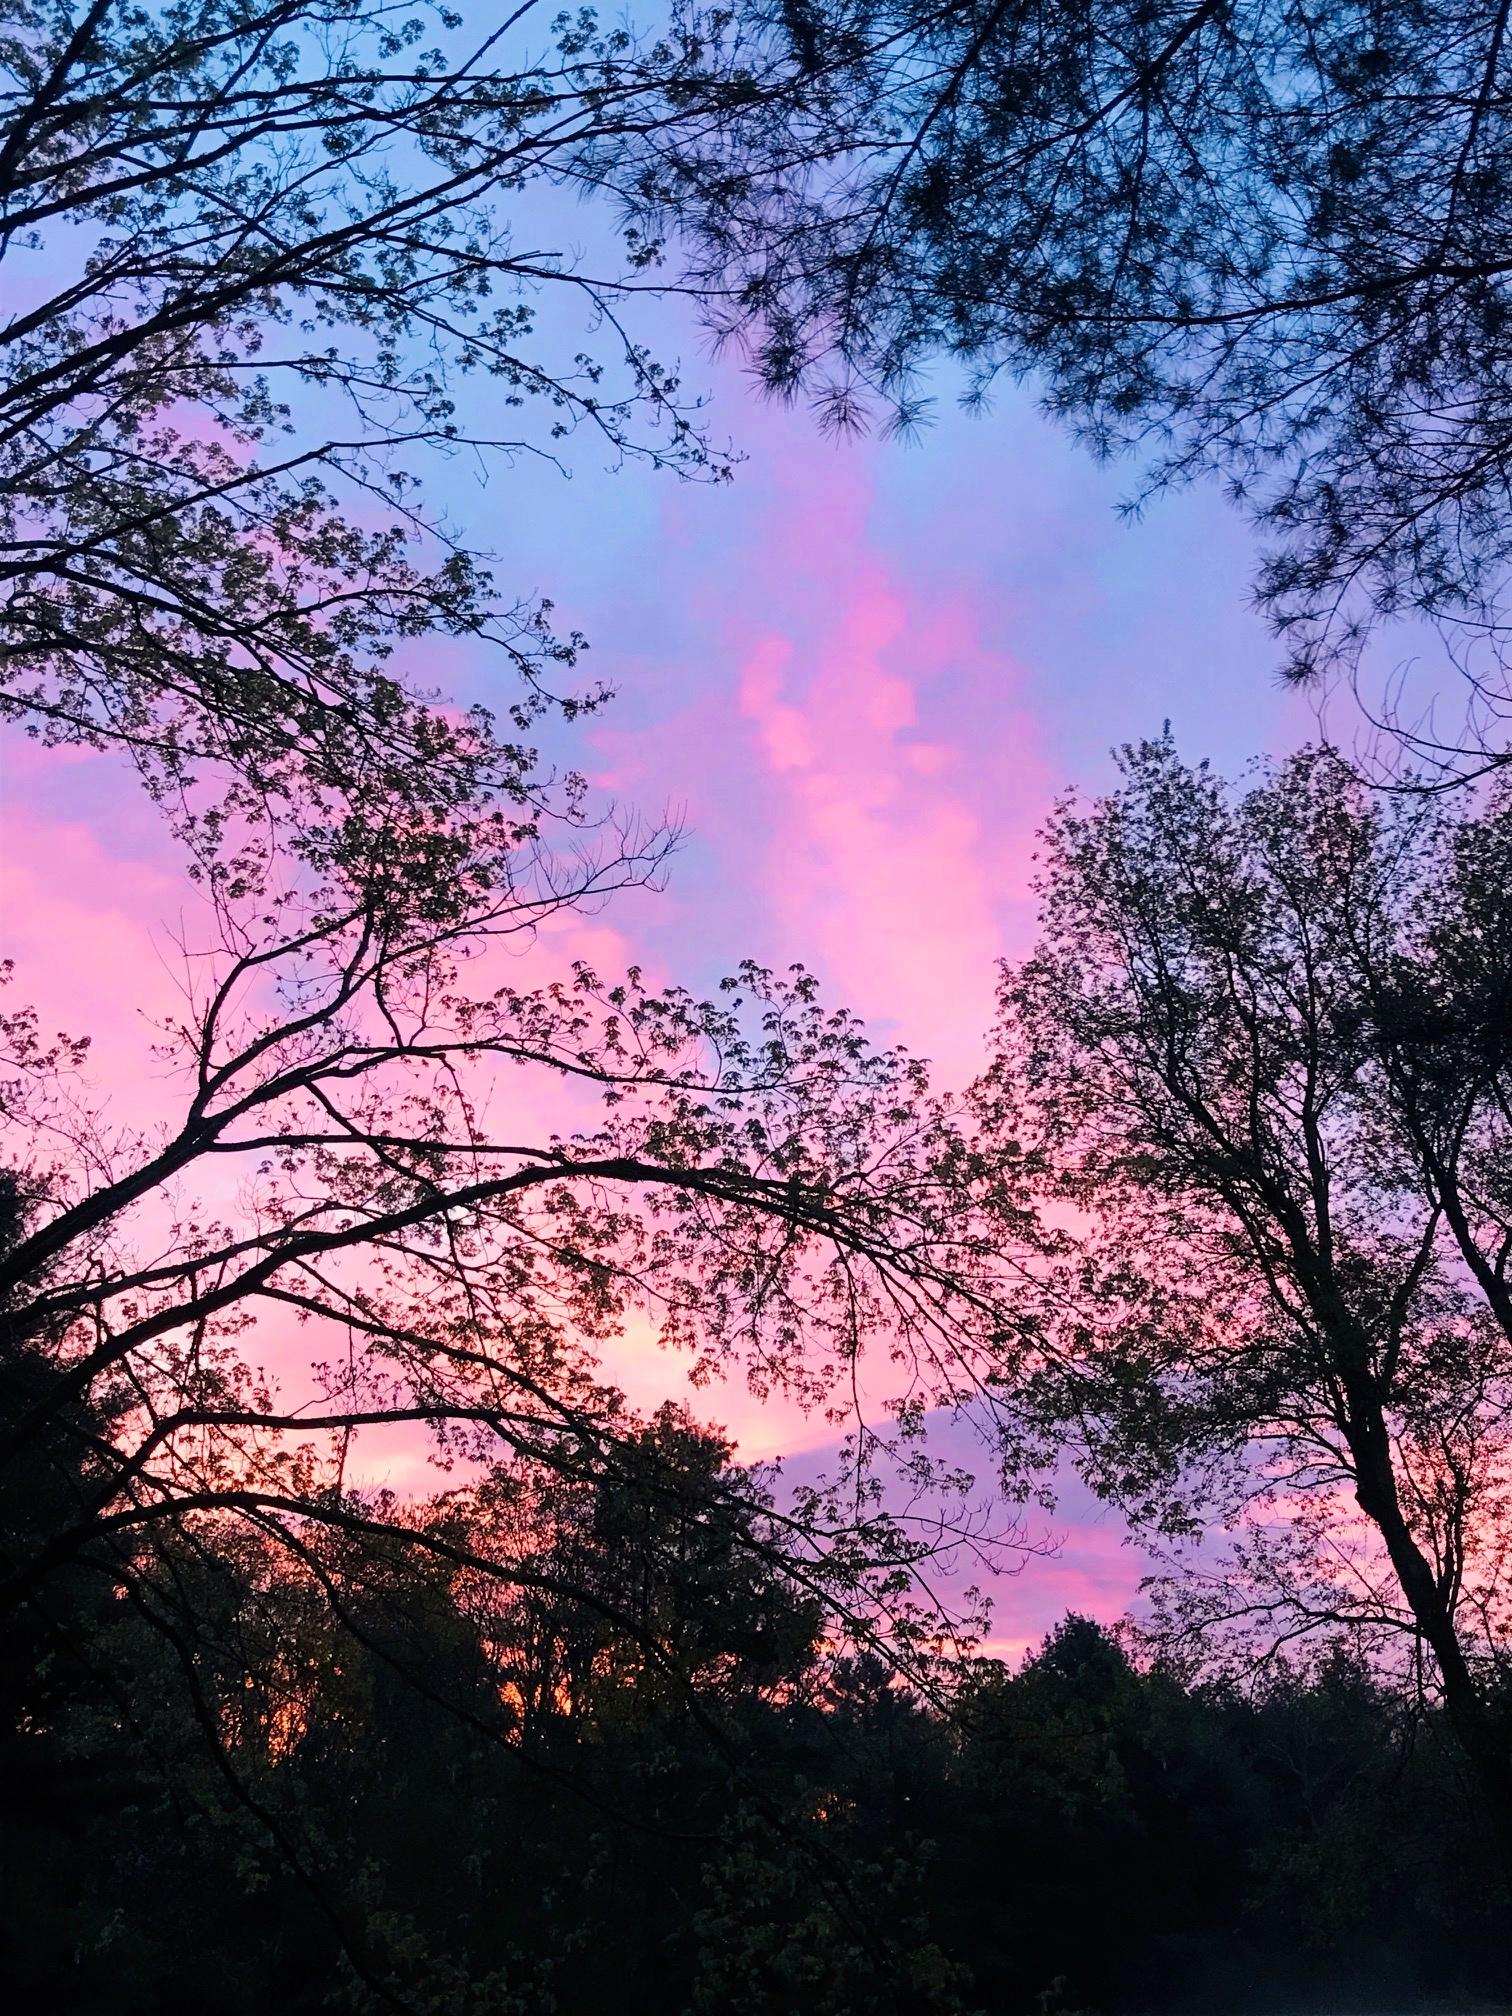 Sunrise Pink & Blue